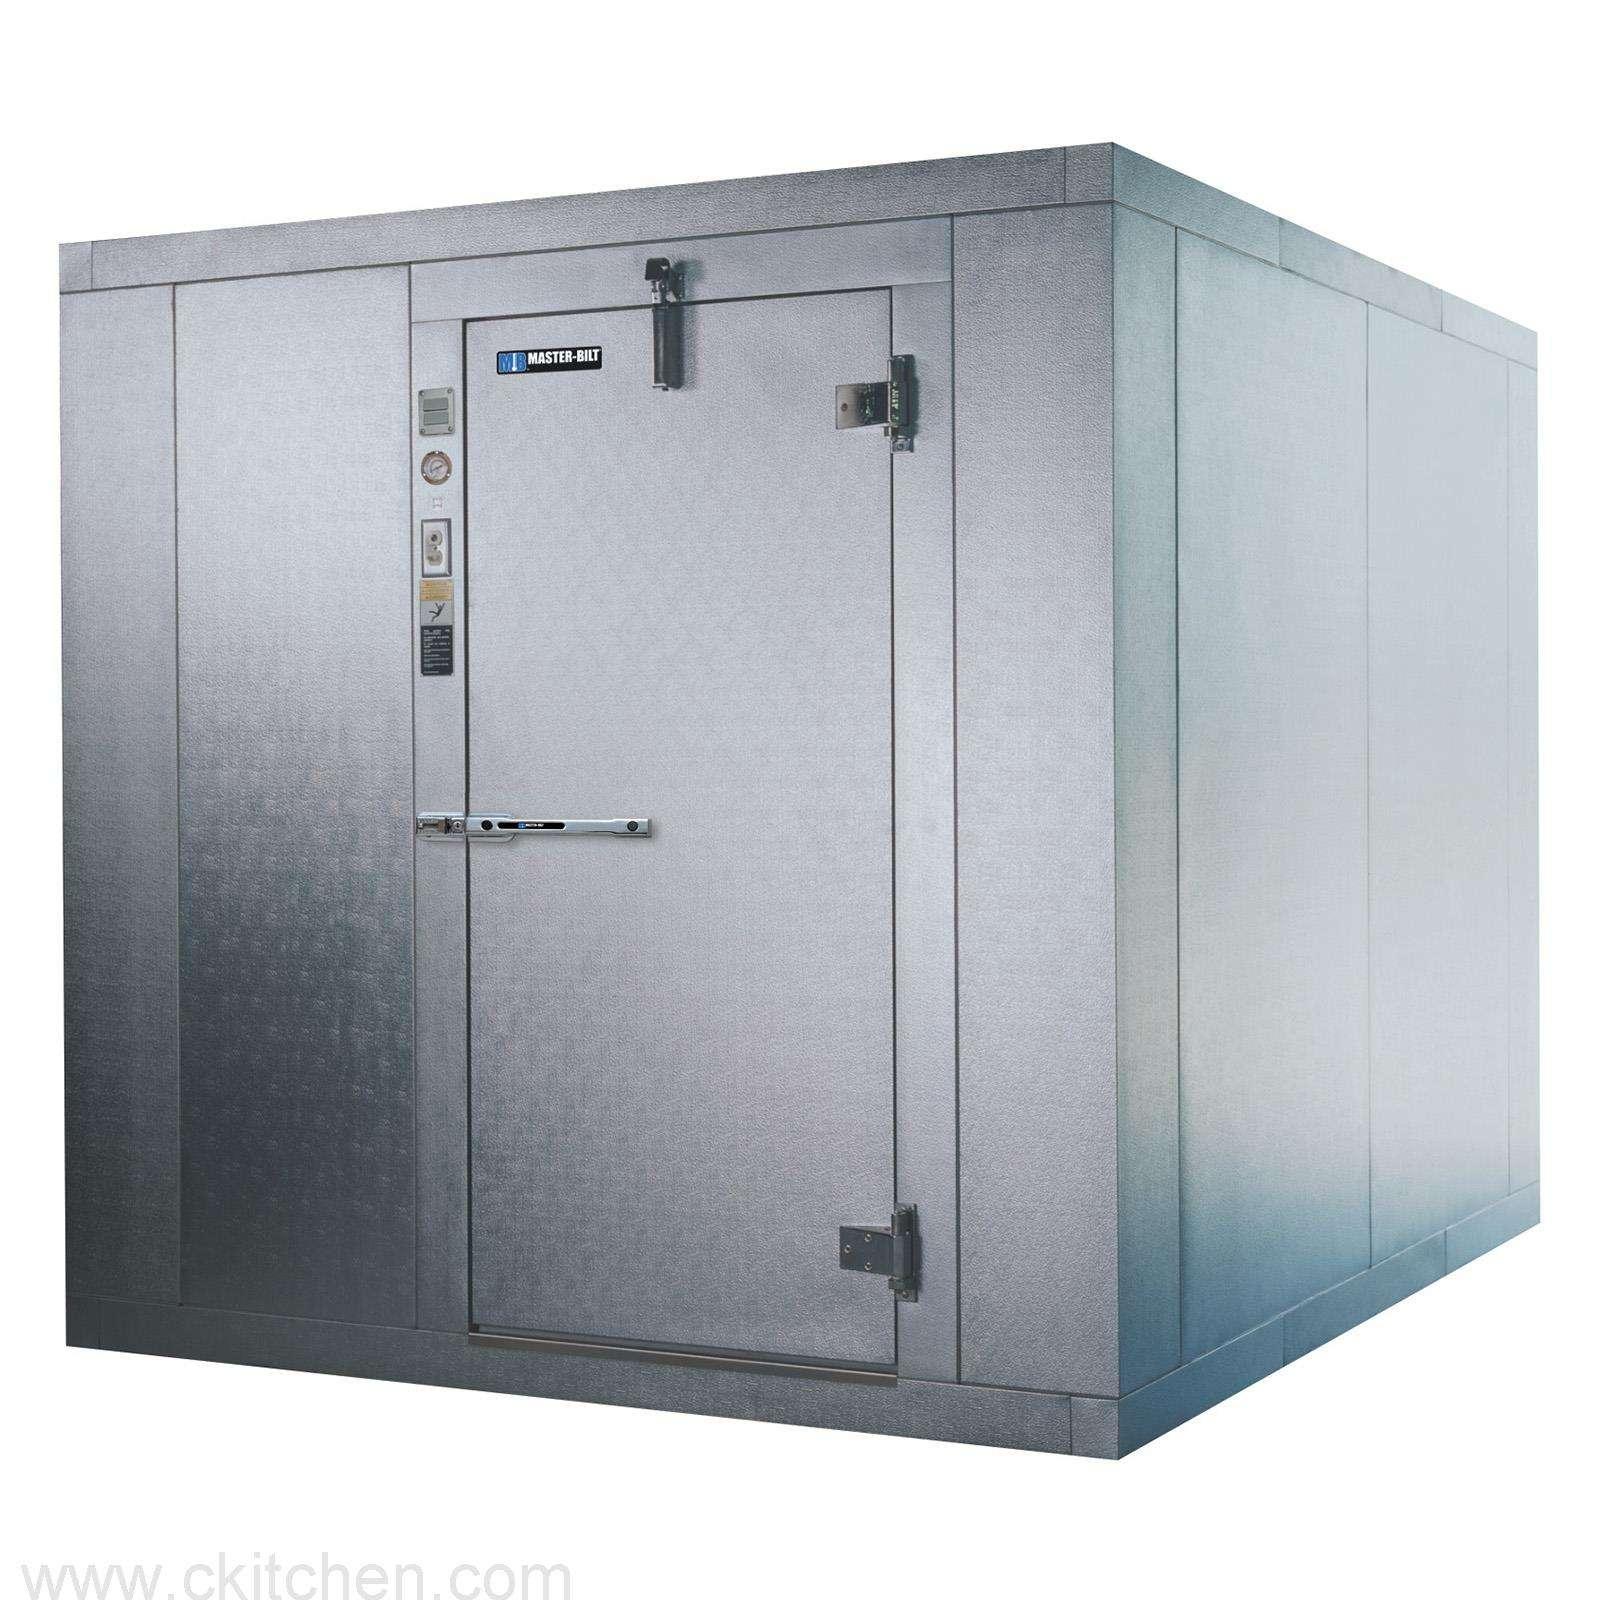 Commercial Kitchen Equipment Specs